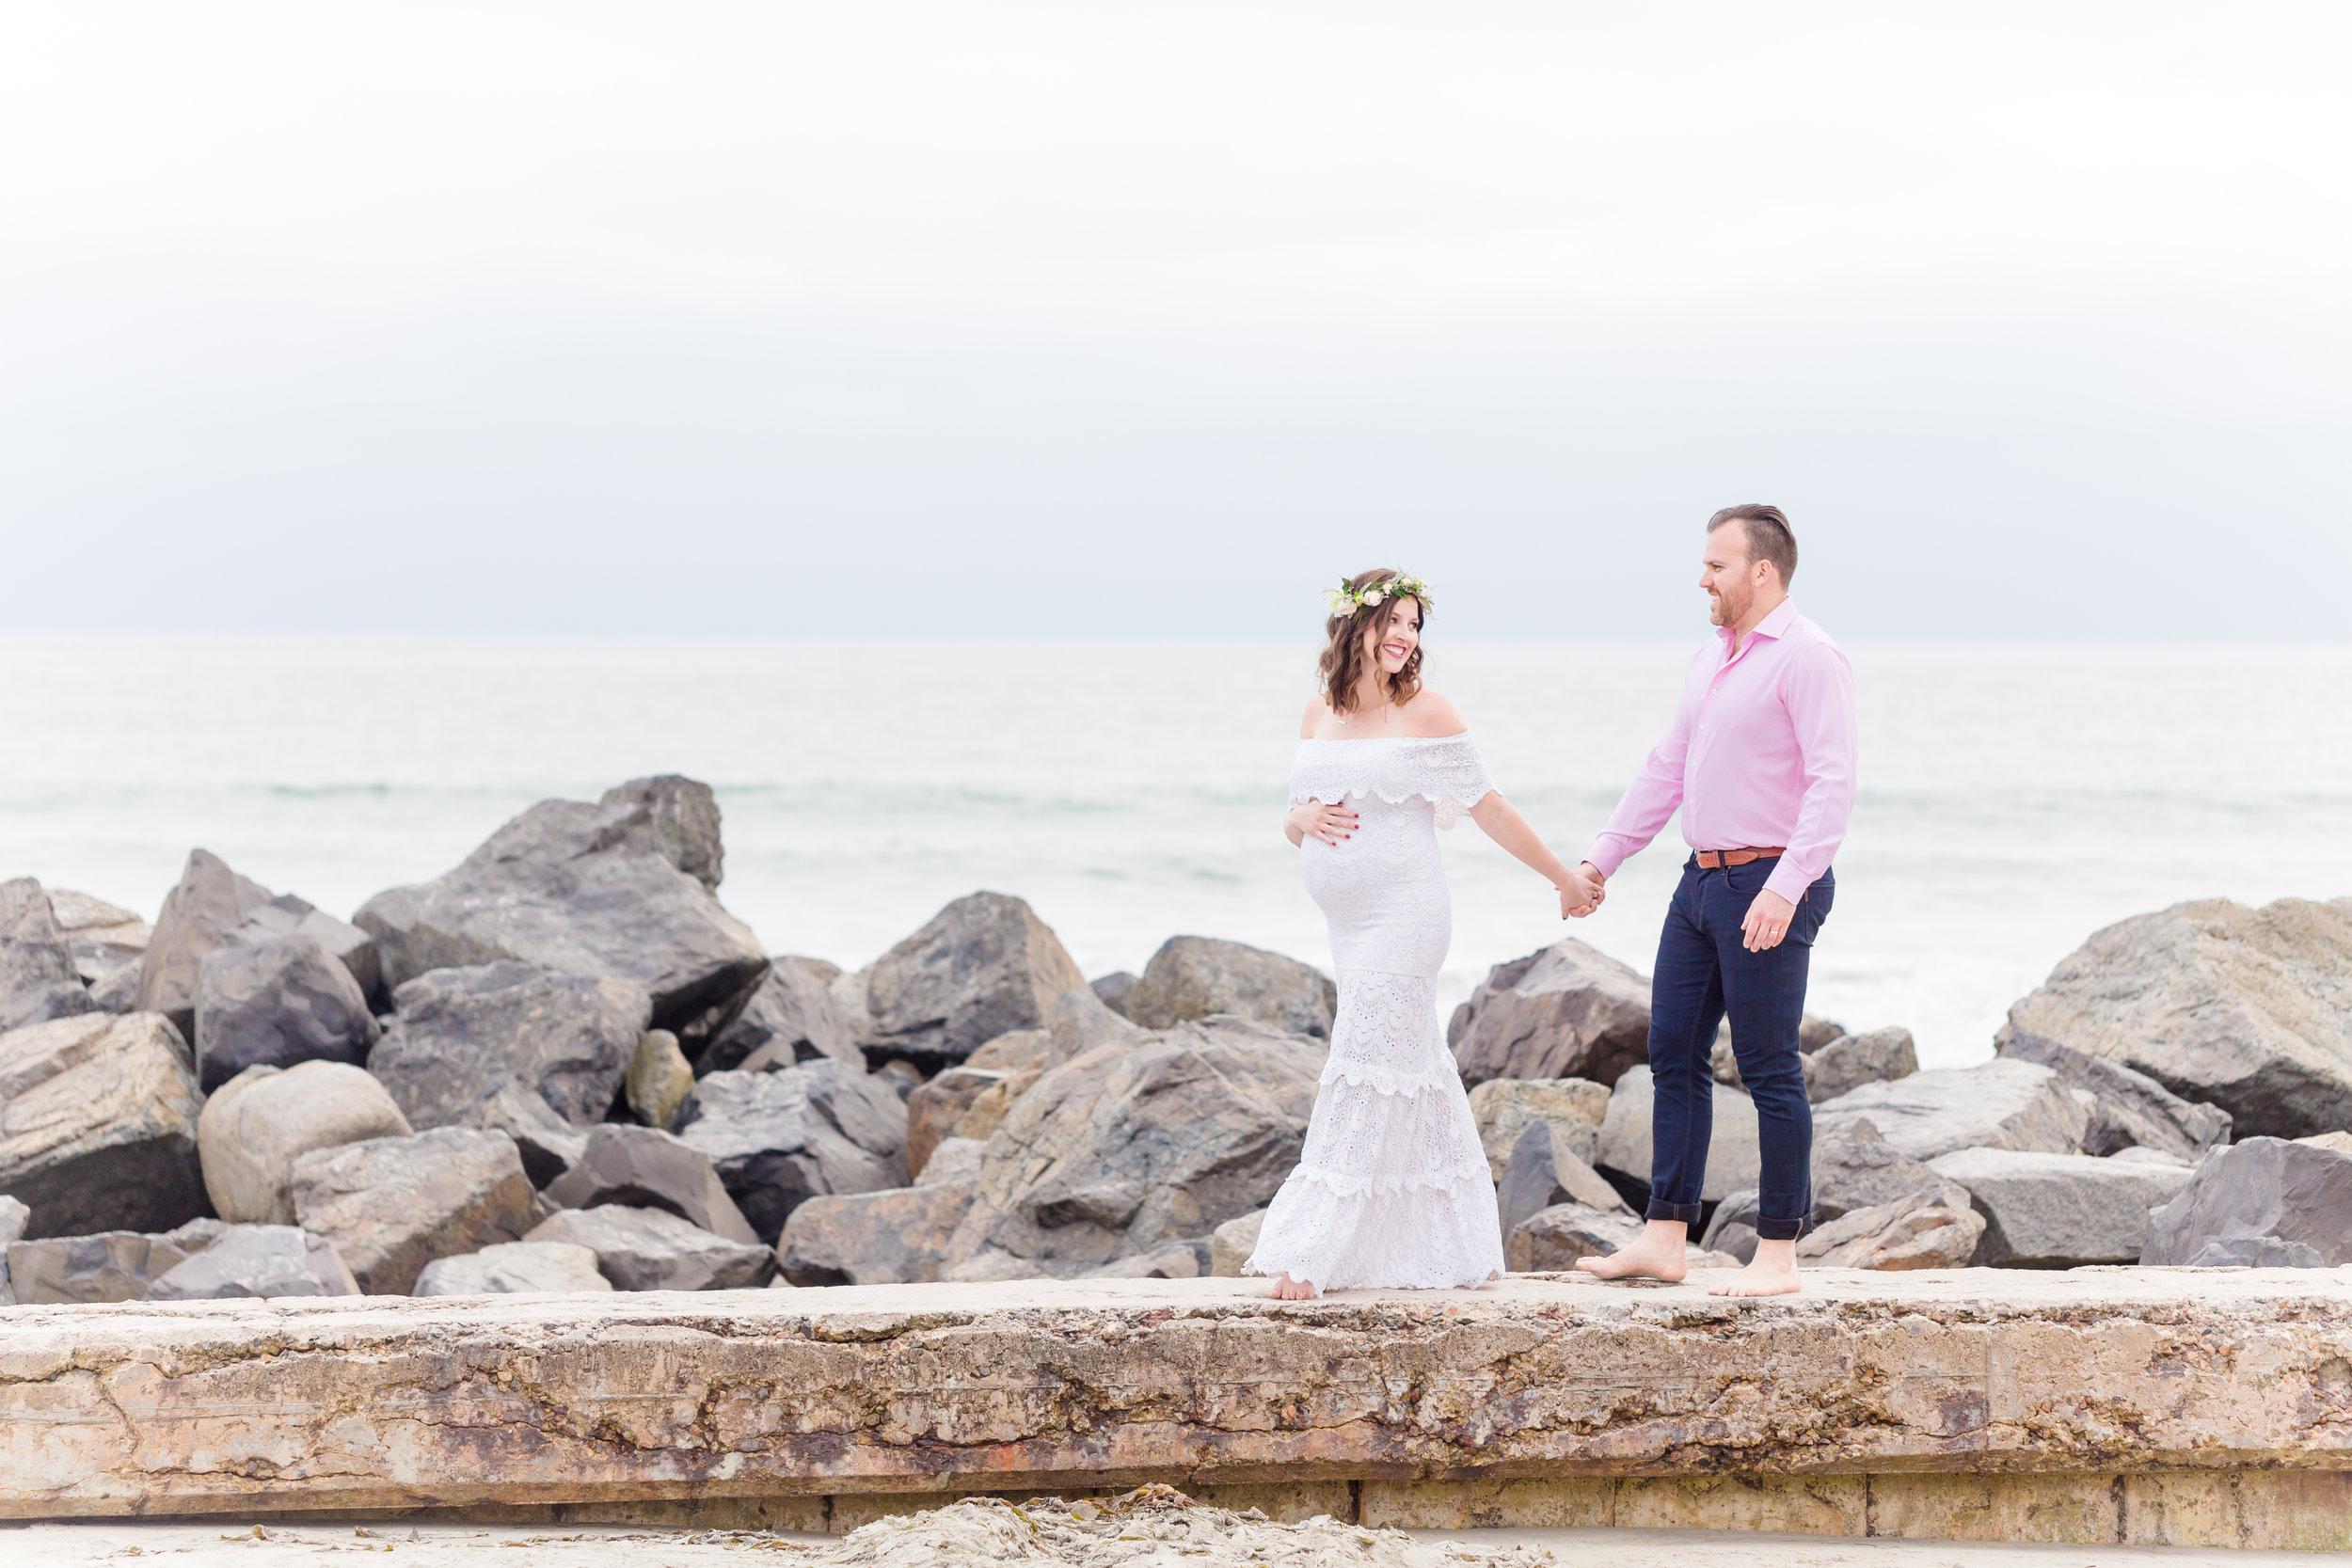 Brett & Deanna | Coronado Maternity Photos